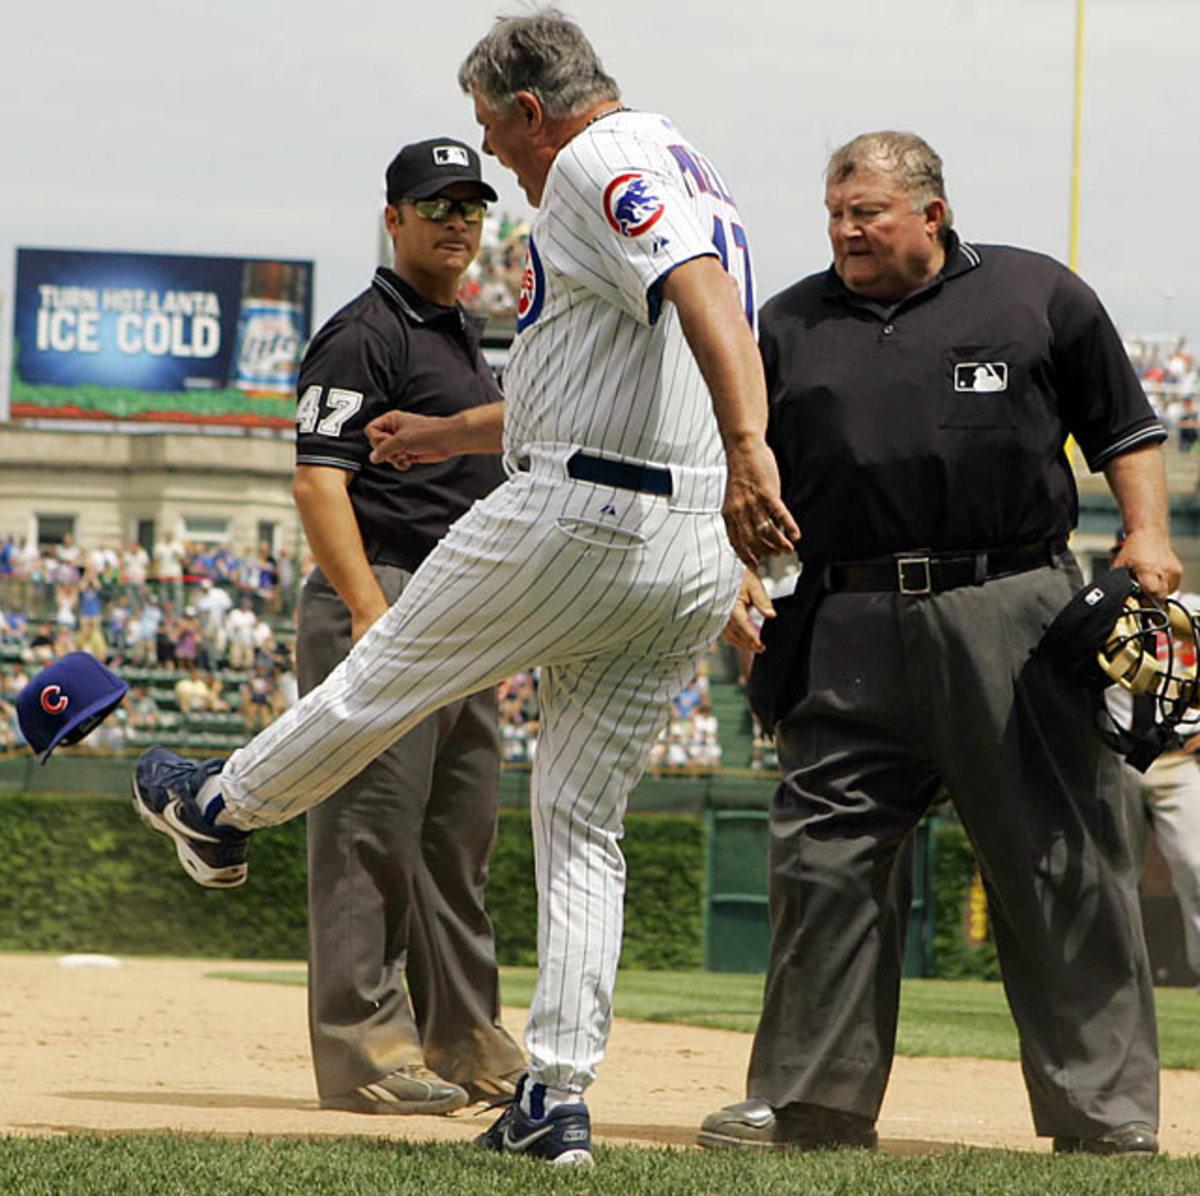 2007.lou-piniella.Baseball.jpg